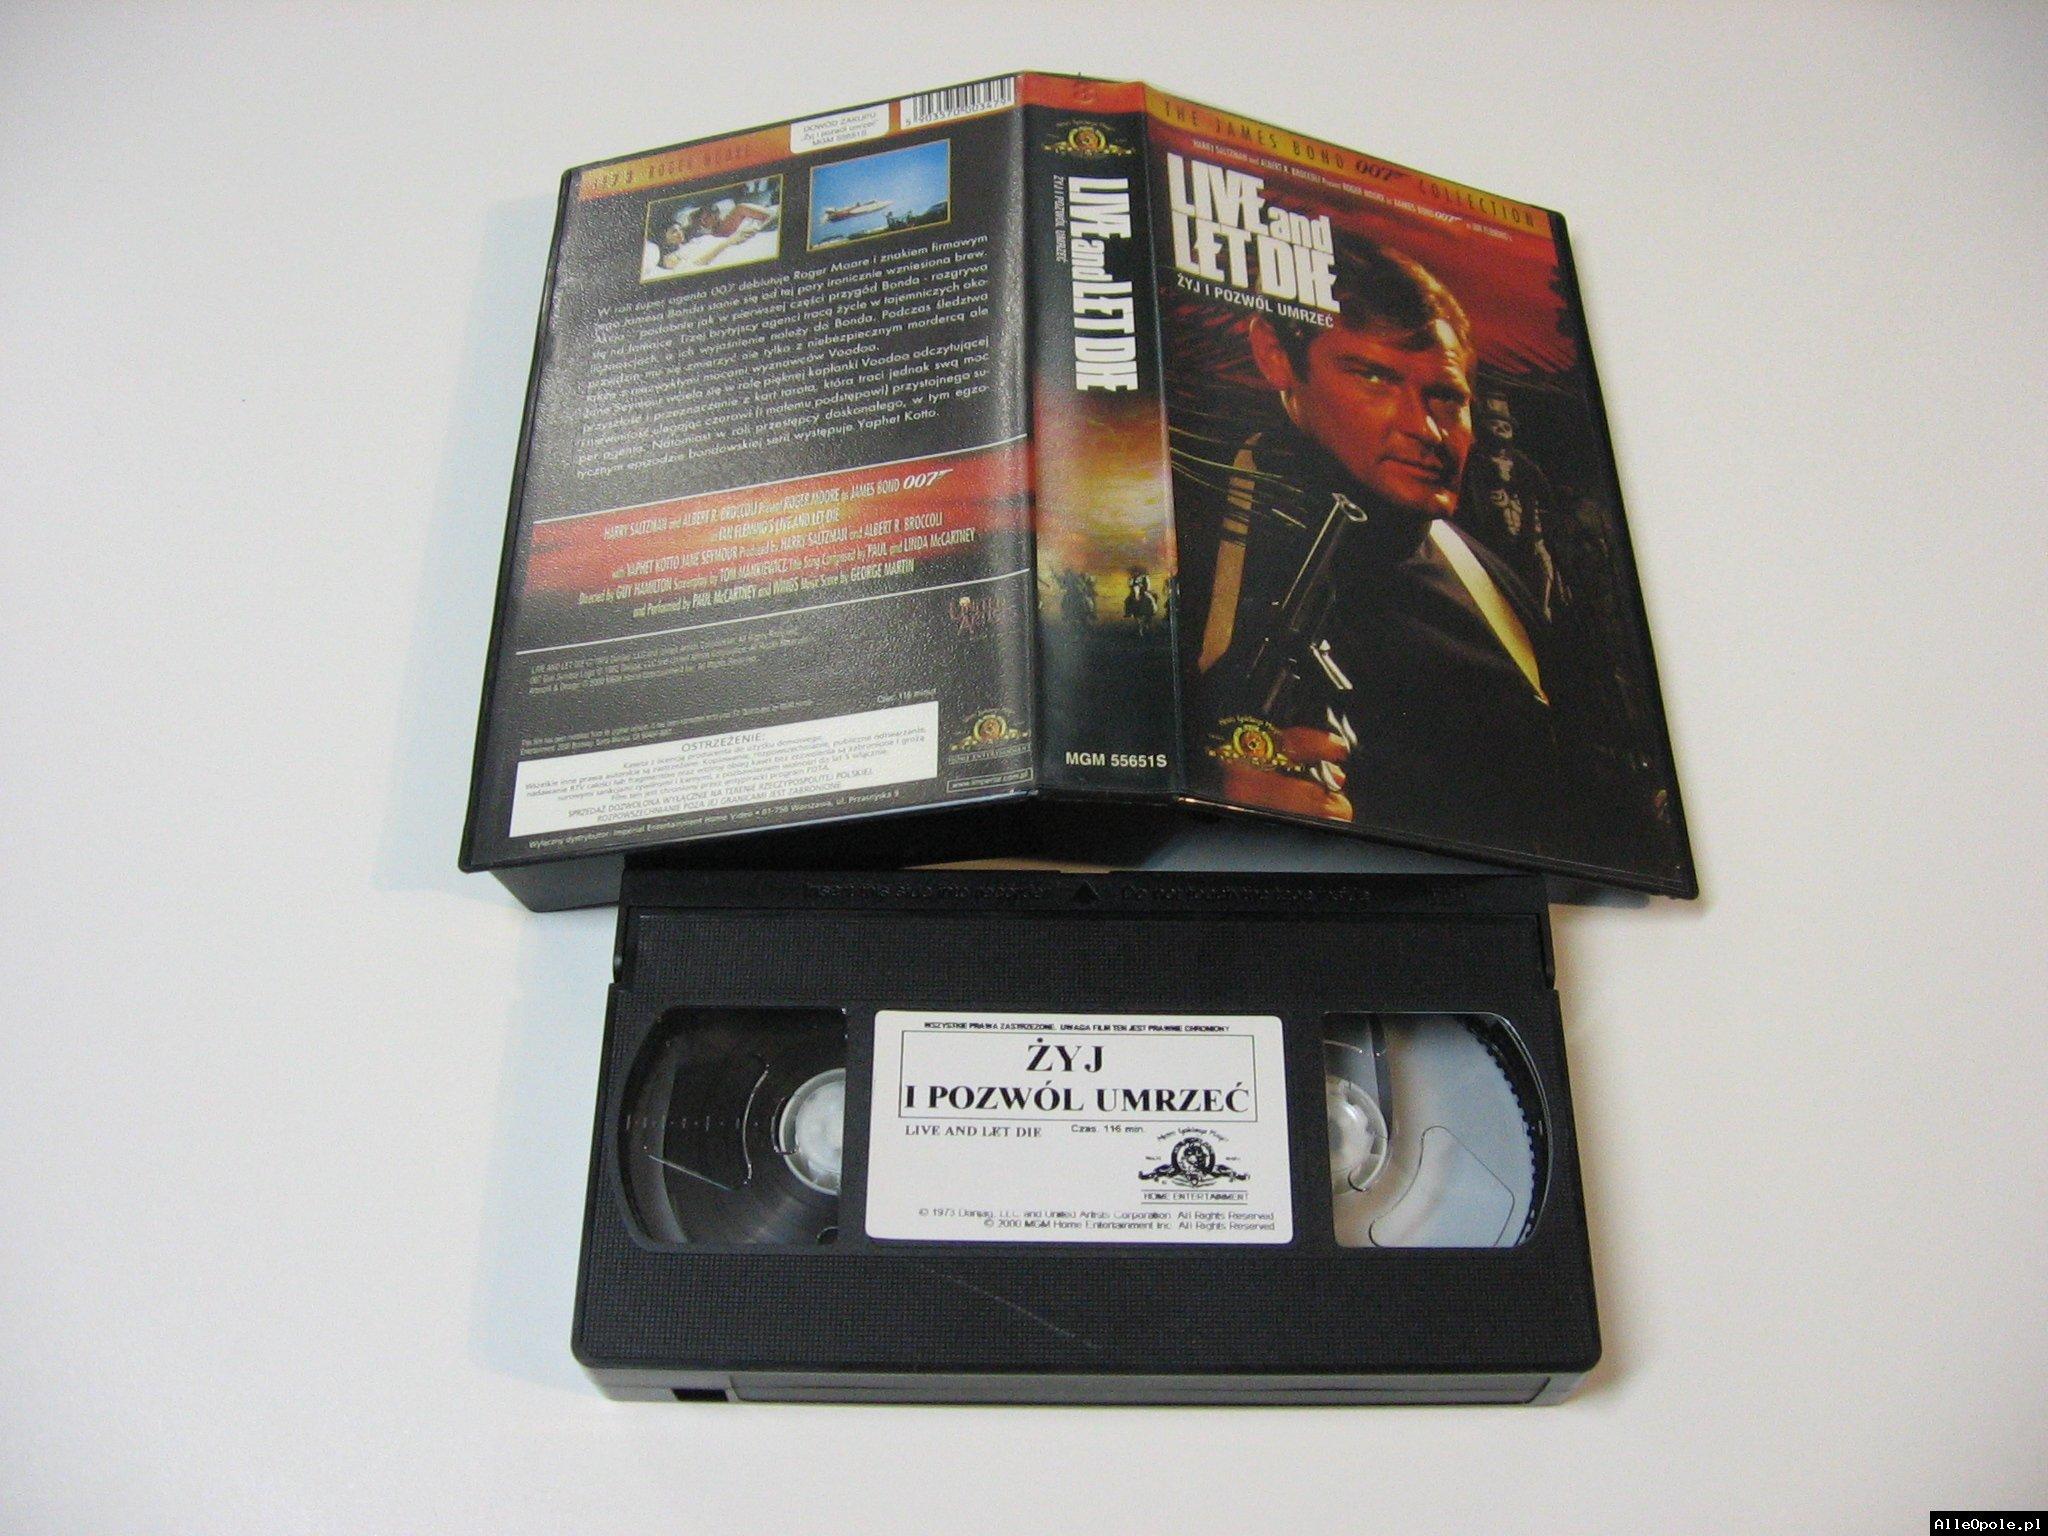 007 ŻYJ I POZWÓL UMRZEĆ - VHS Kaseta Video - Opole 1729